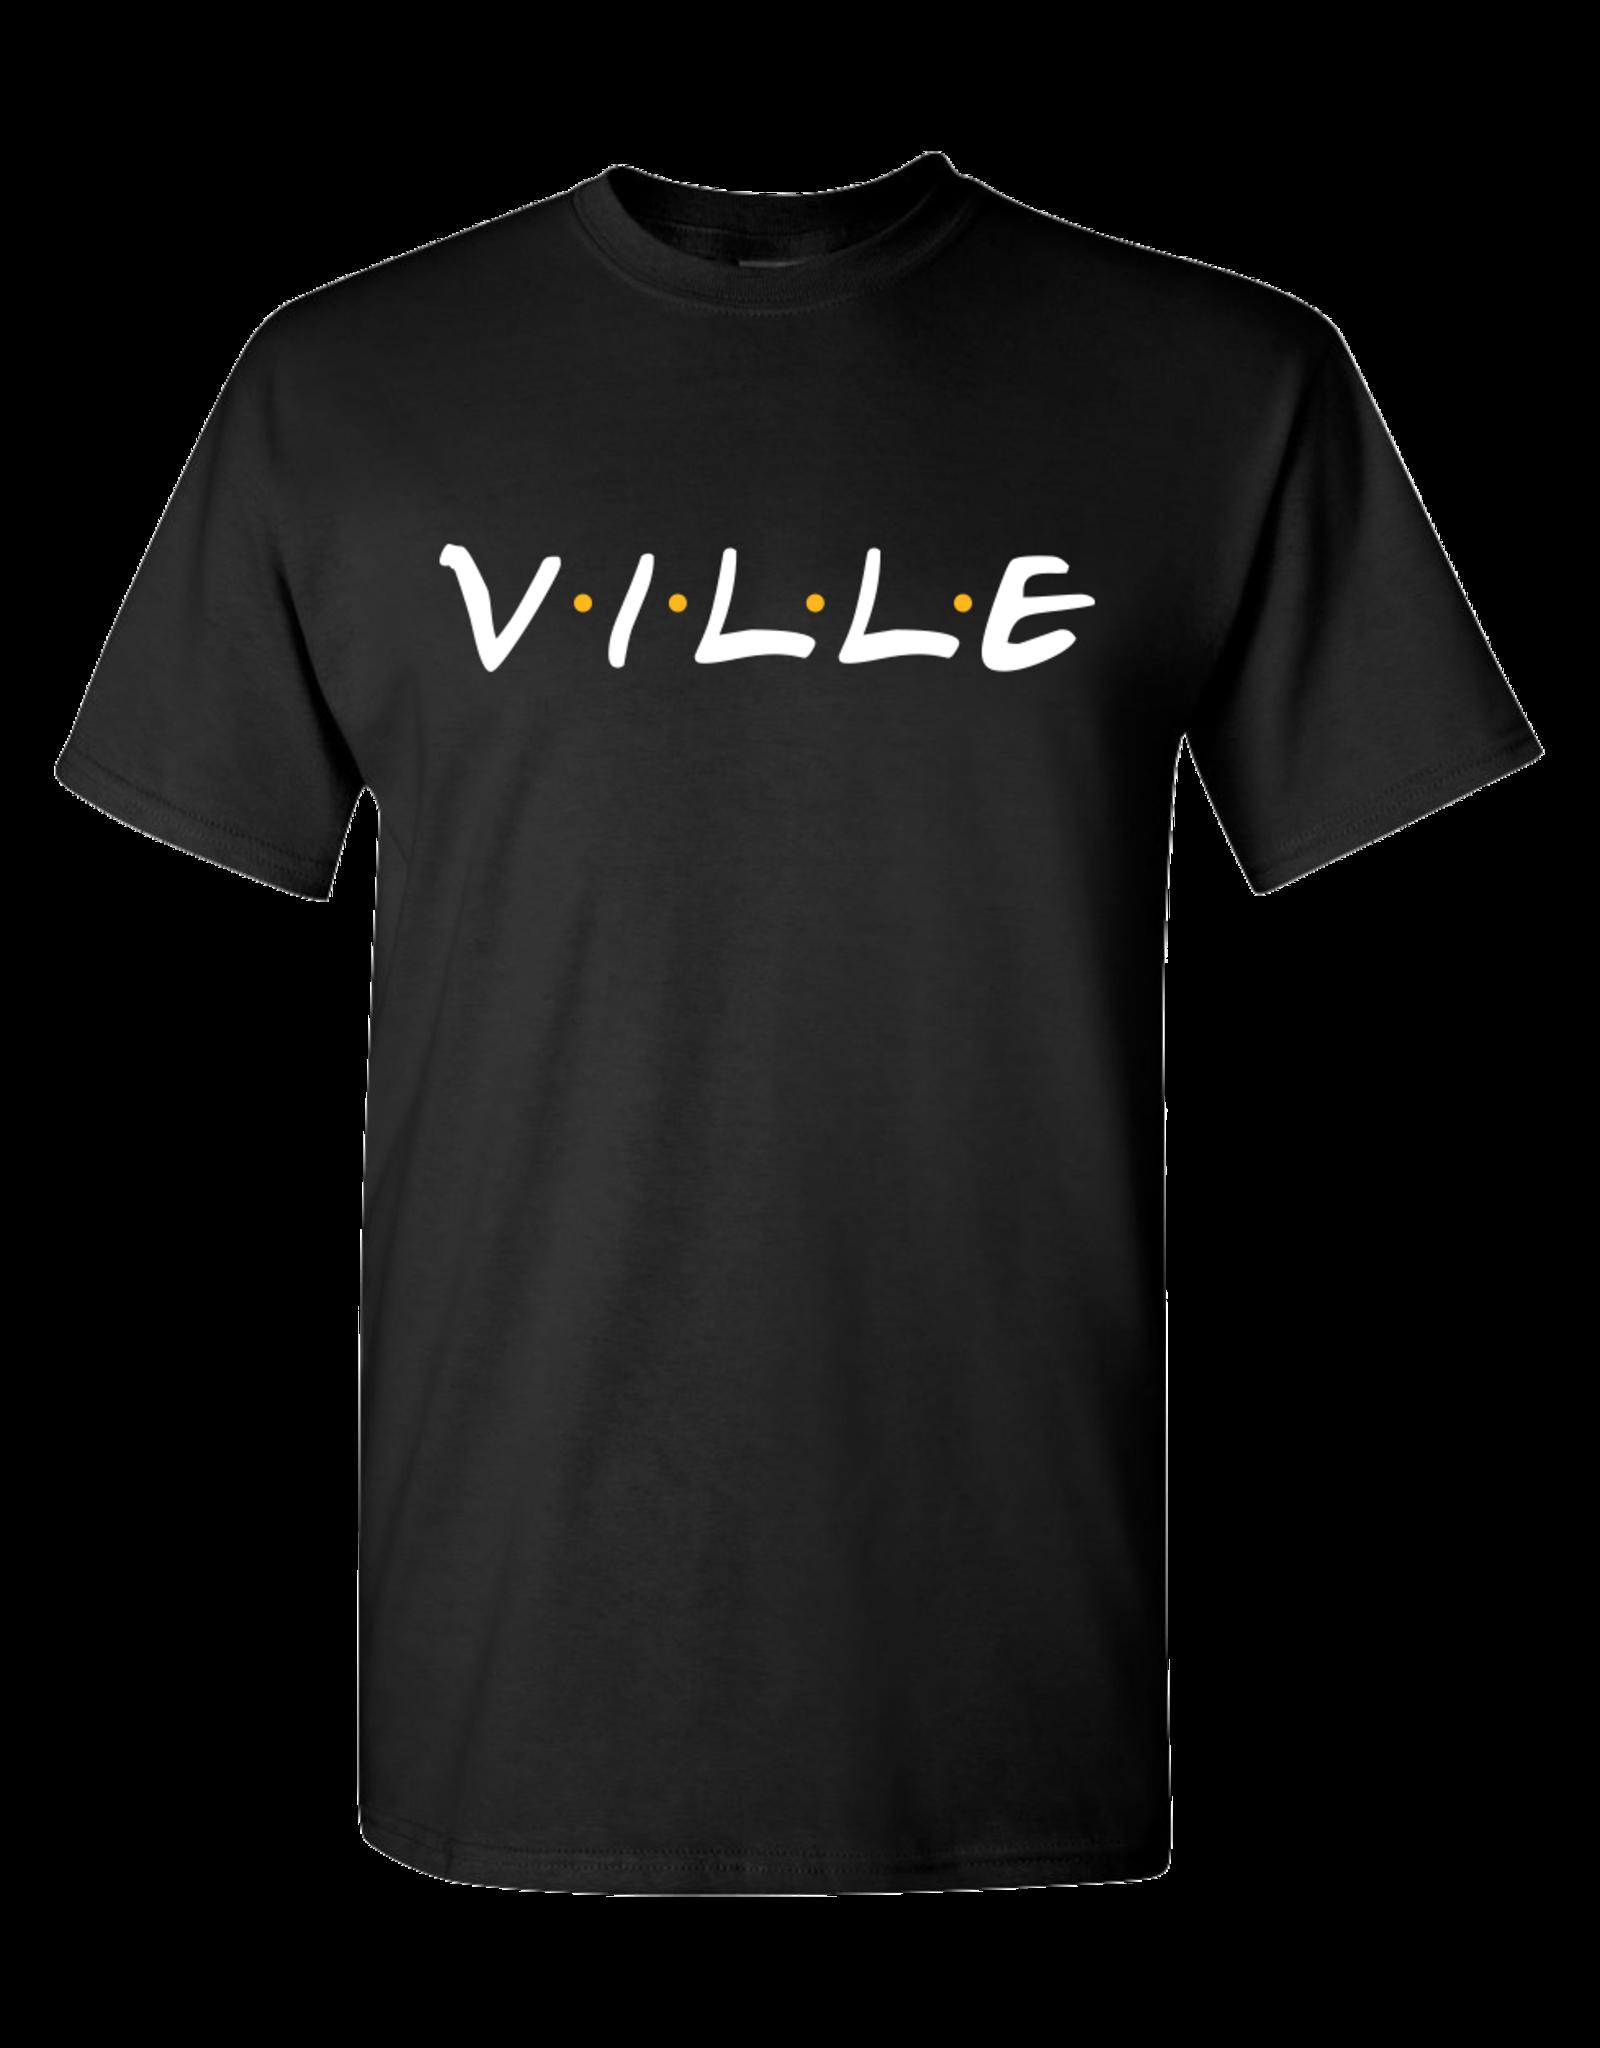 Ville Friends Logo Tee Black